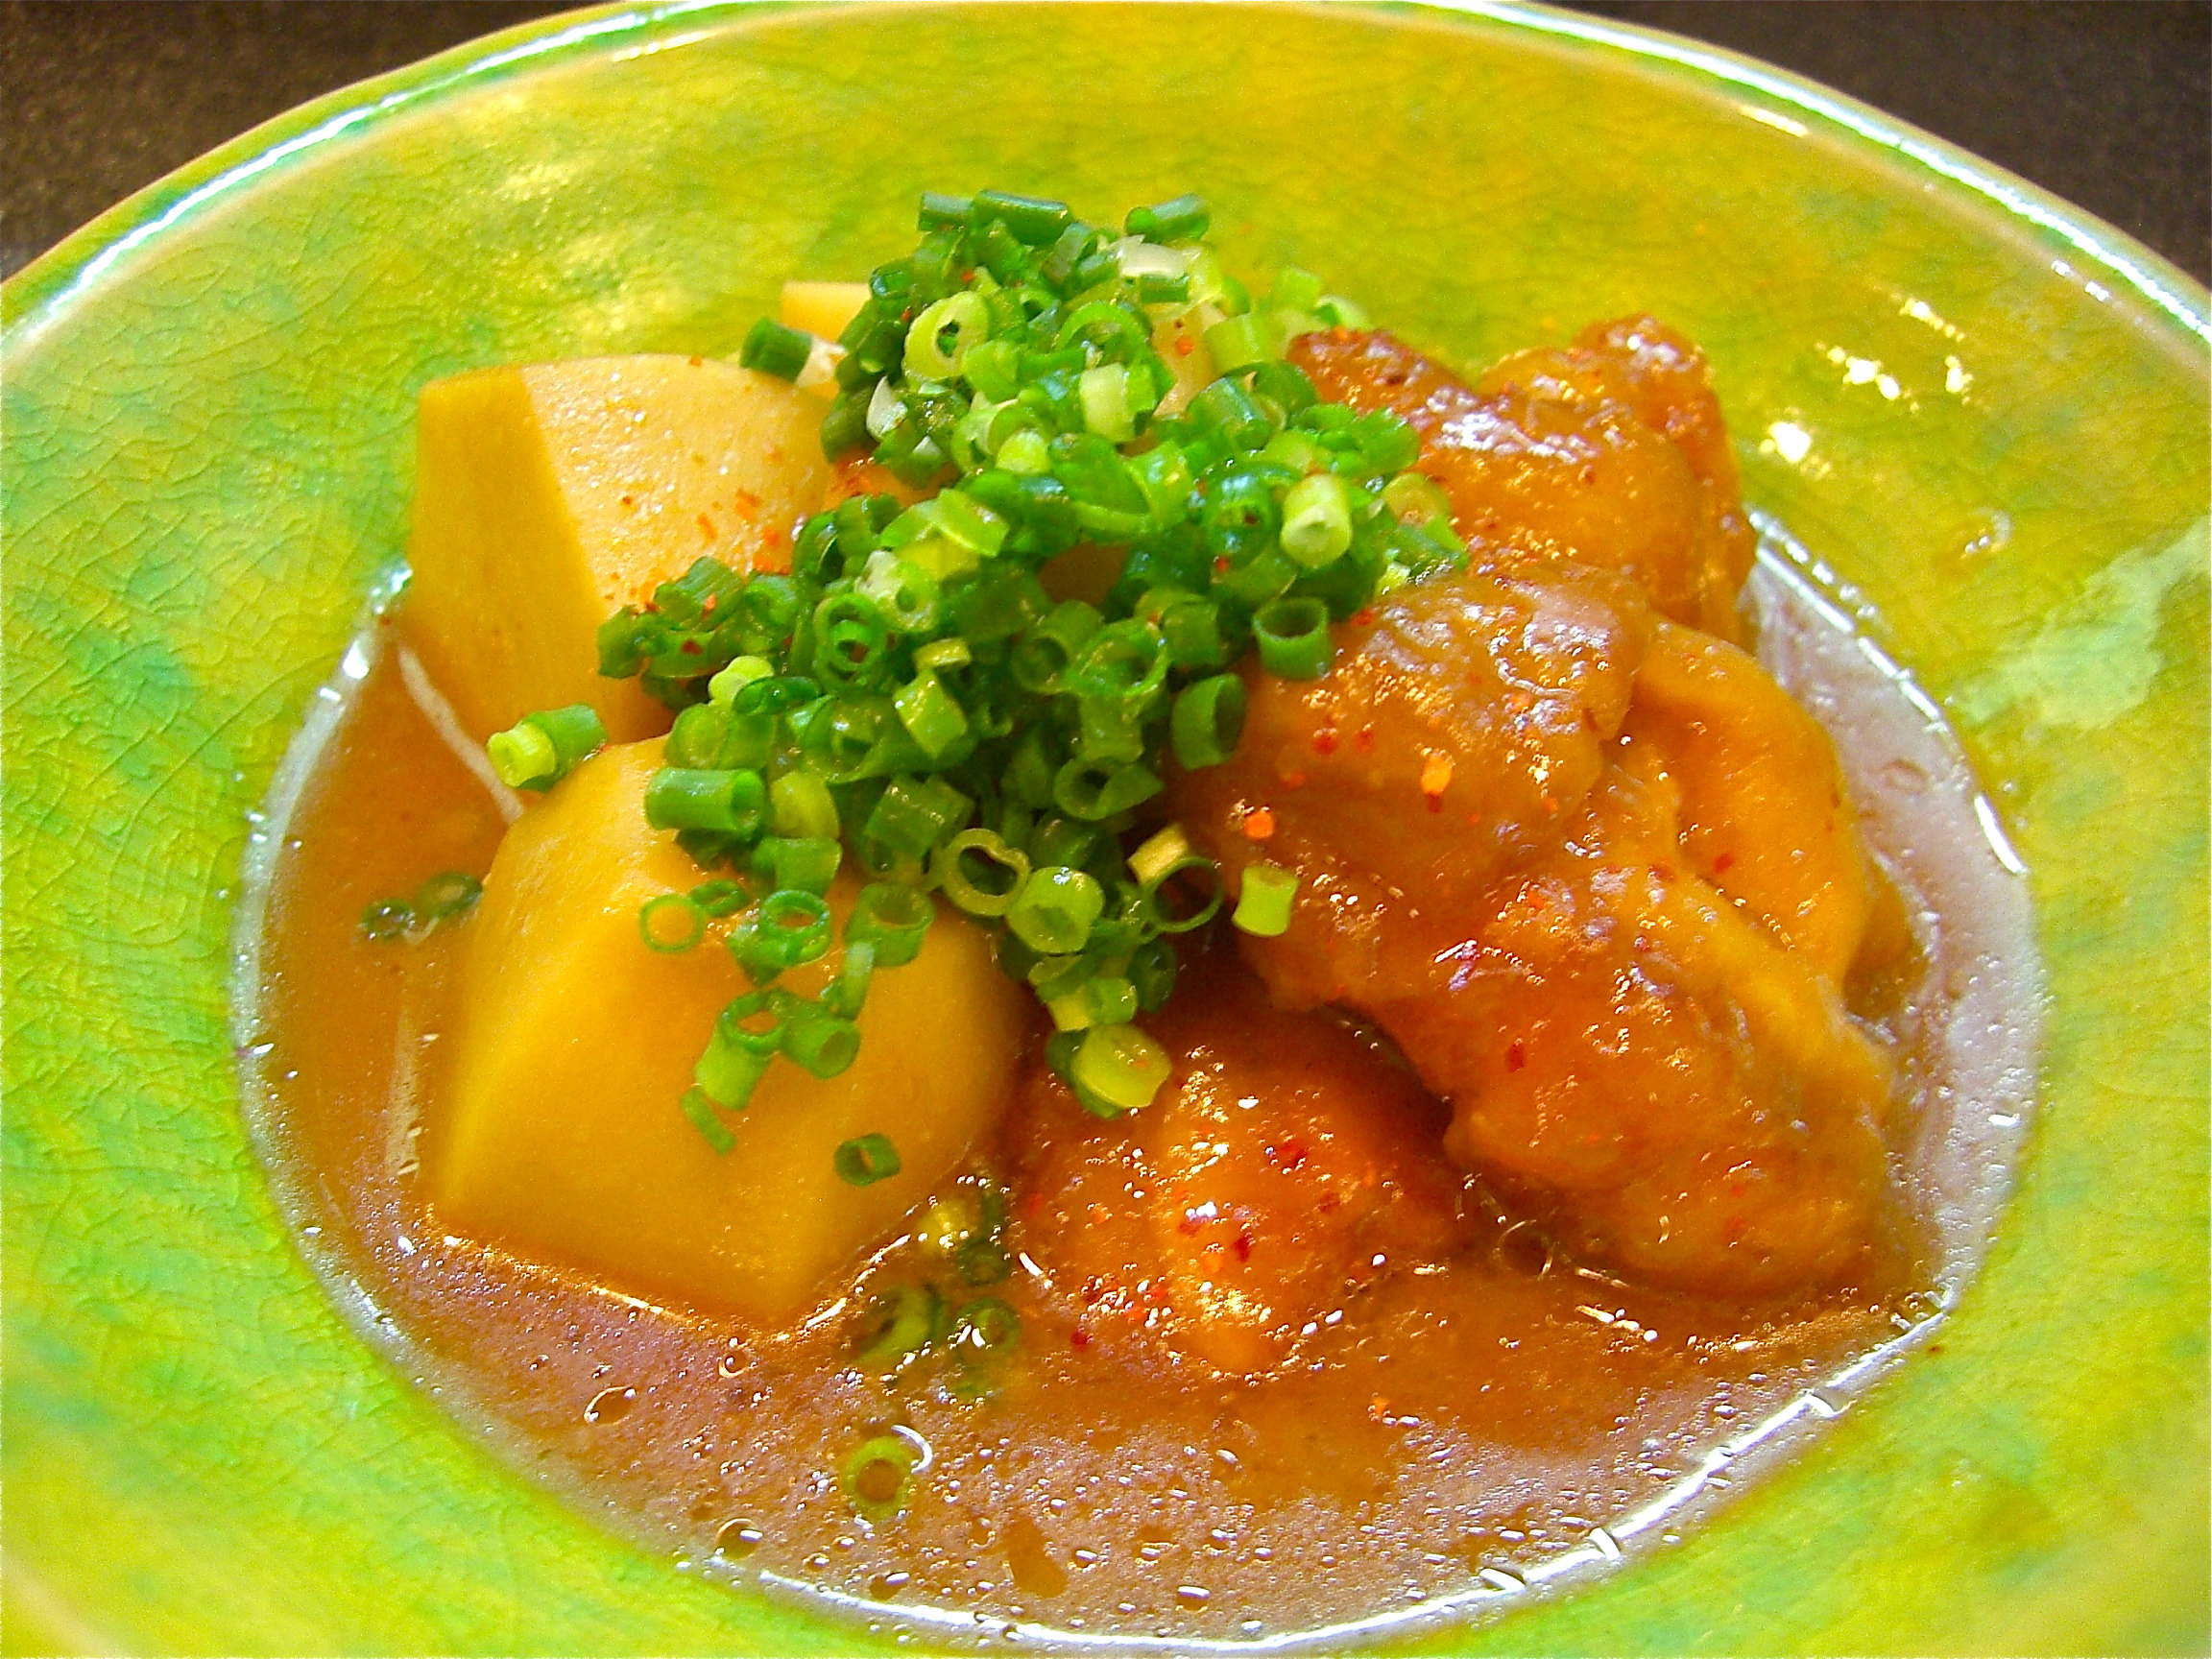 小芋と地鶏の味噌煮(地鶏料理10)(小芋料理1)